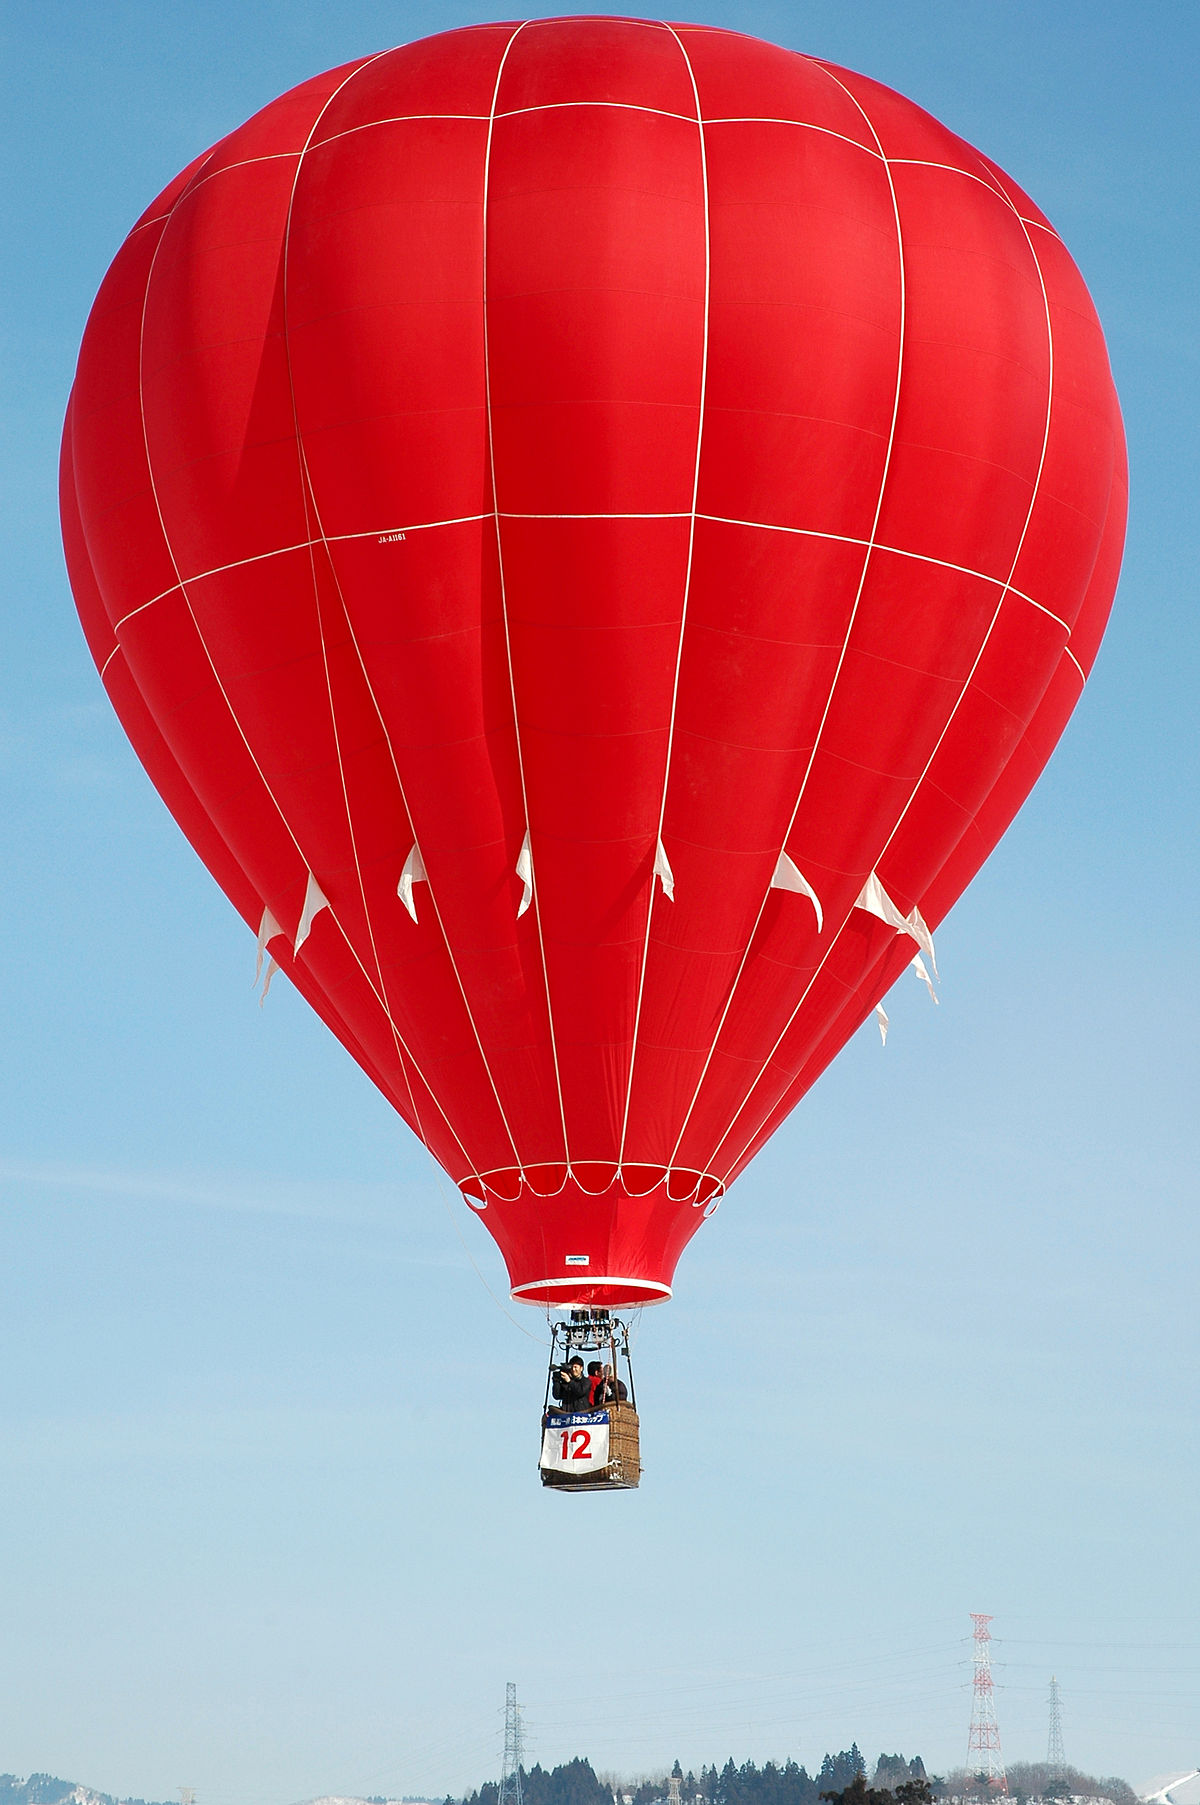 Hot air balloon - Wikipedia